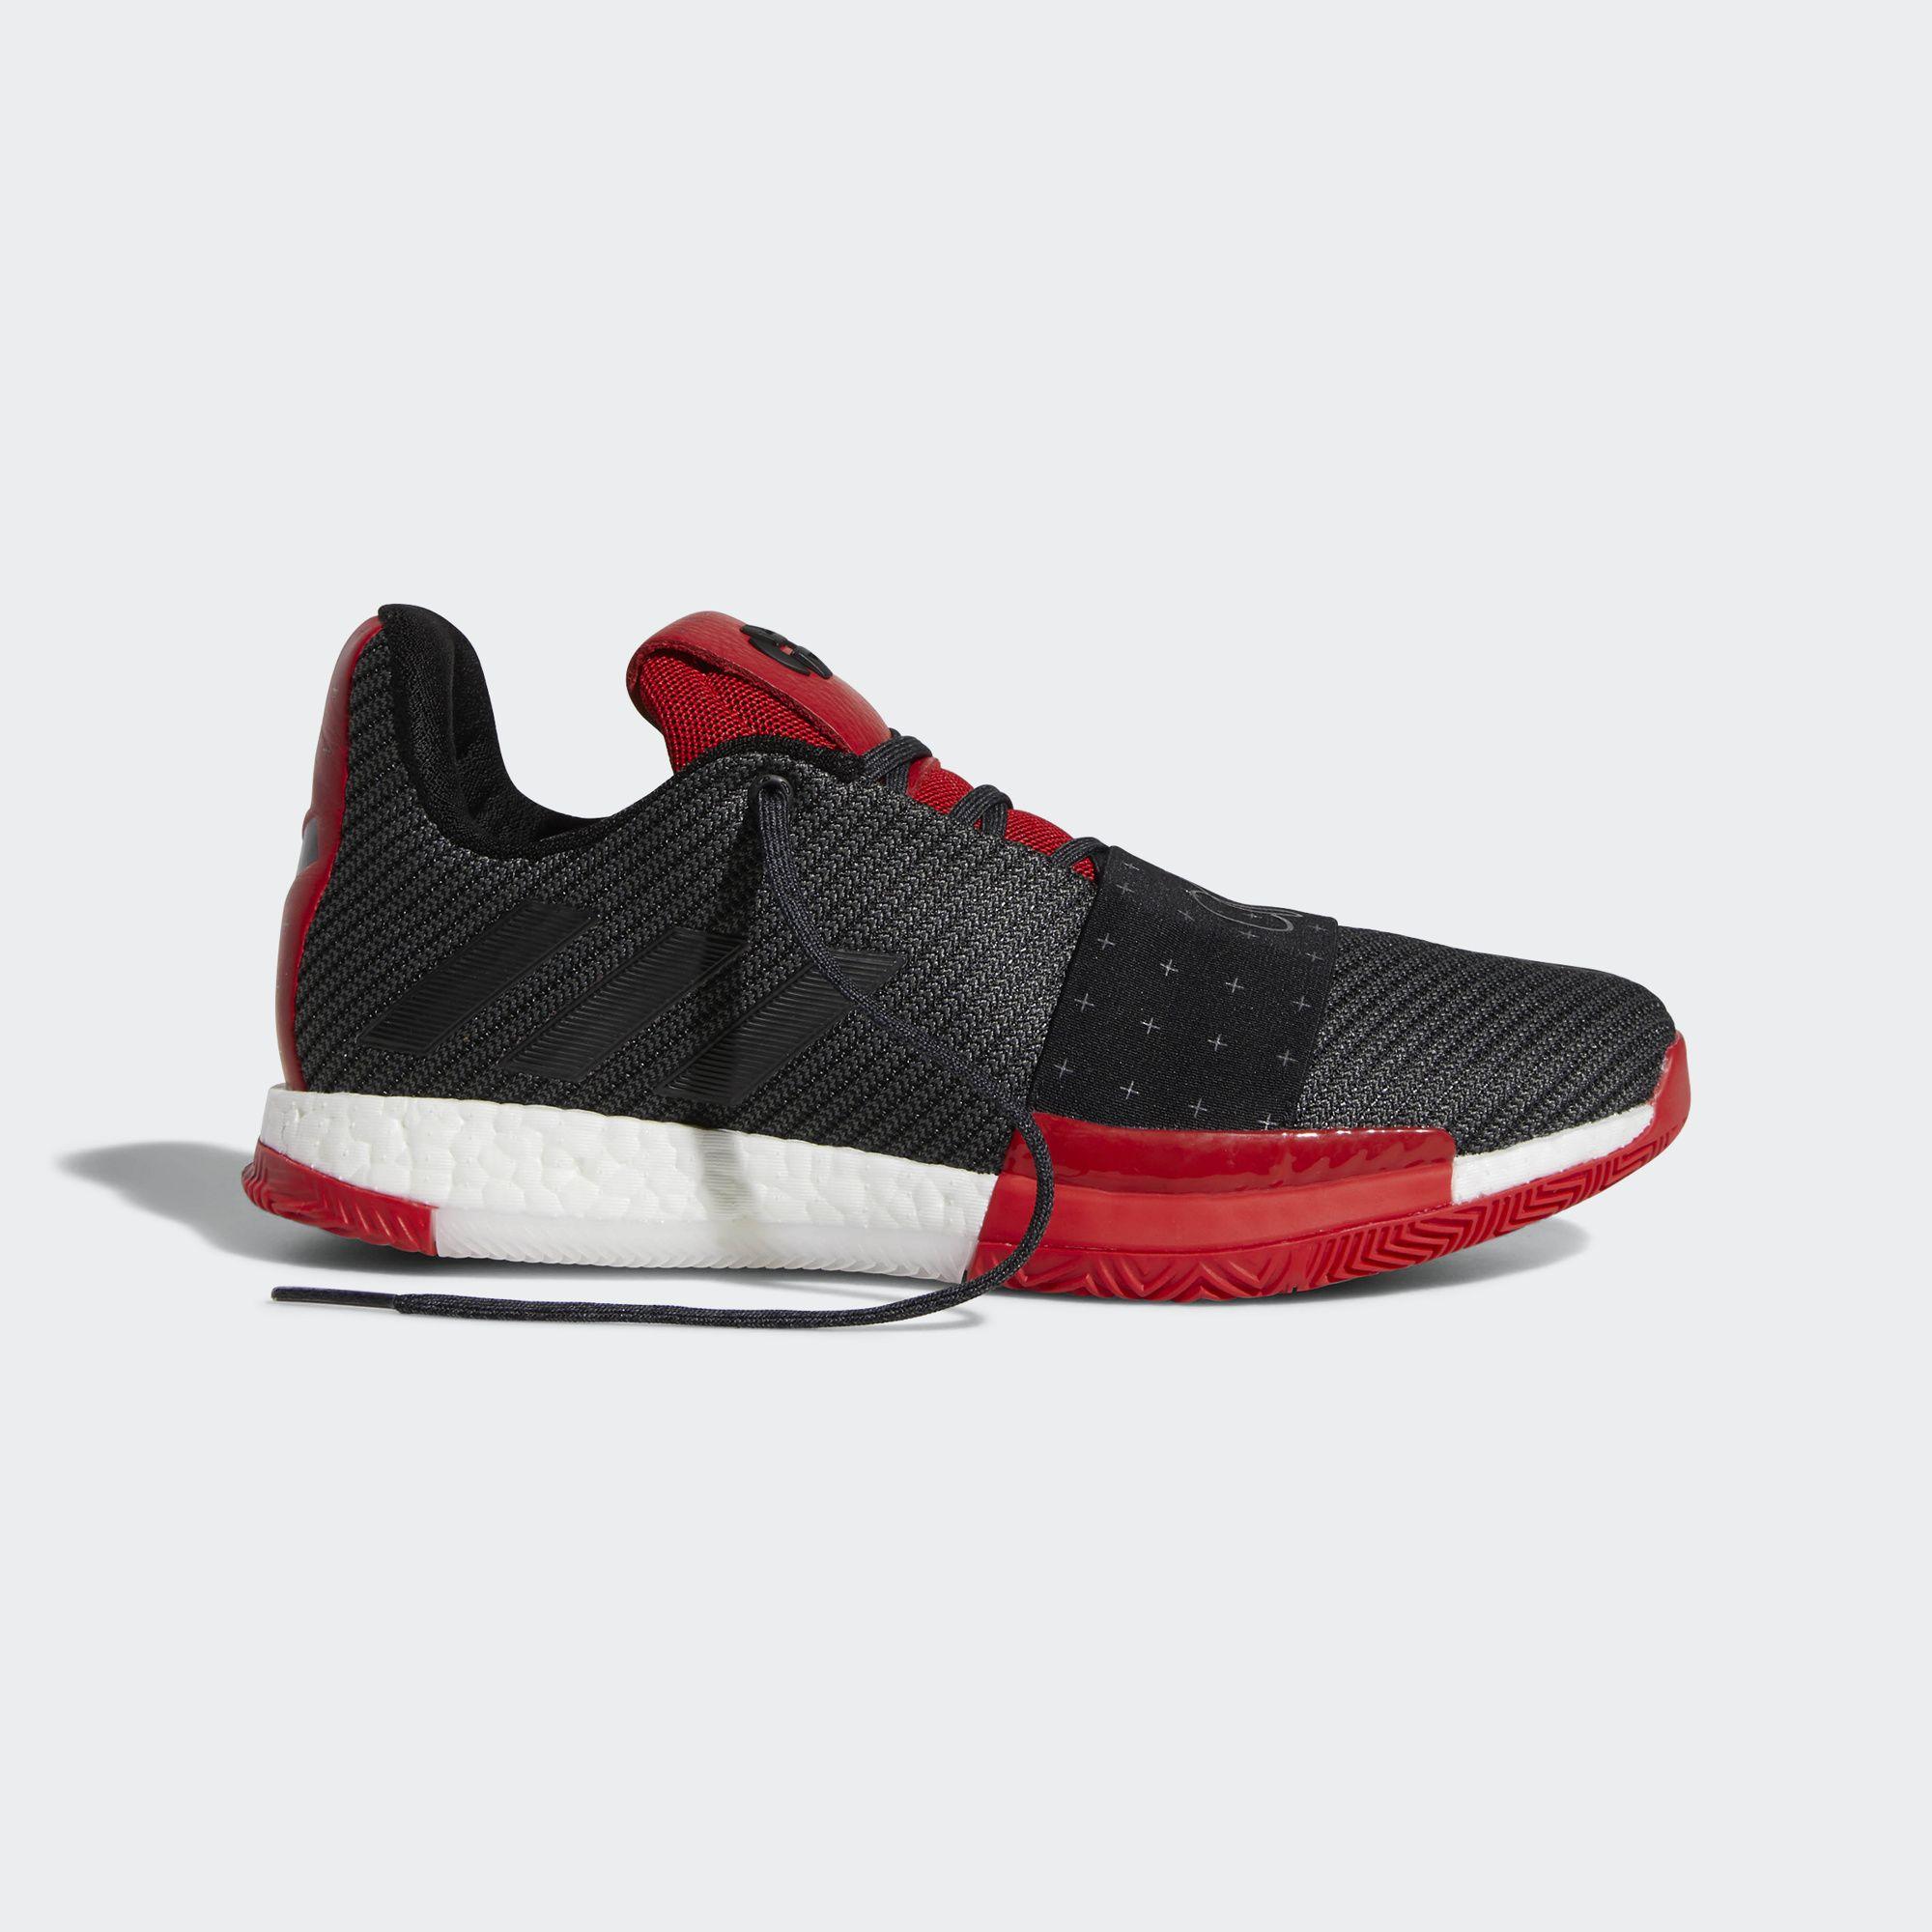 adidas harden vol 3 black red